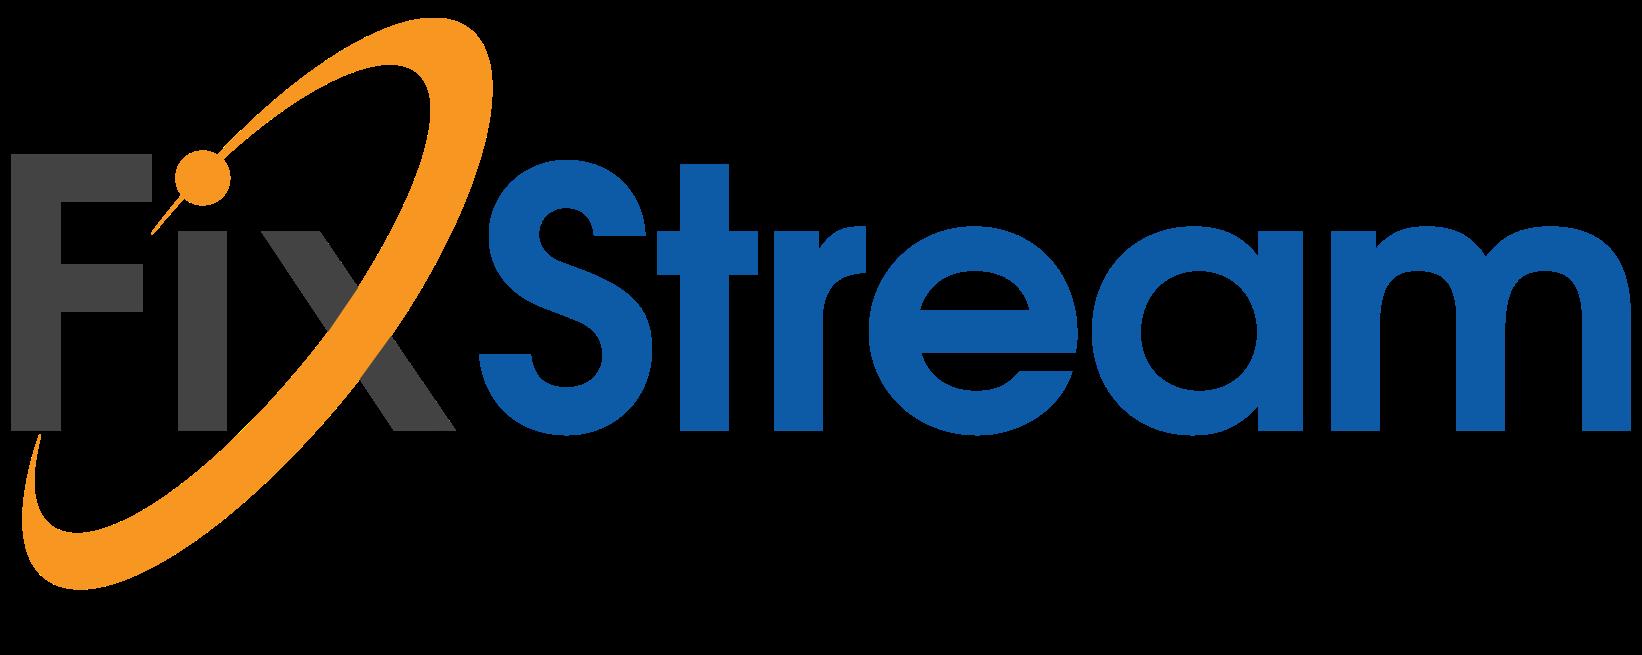 FixStream.png